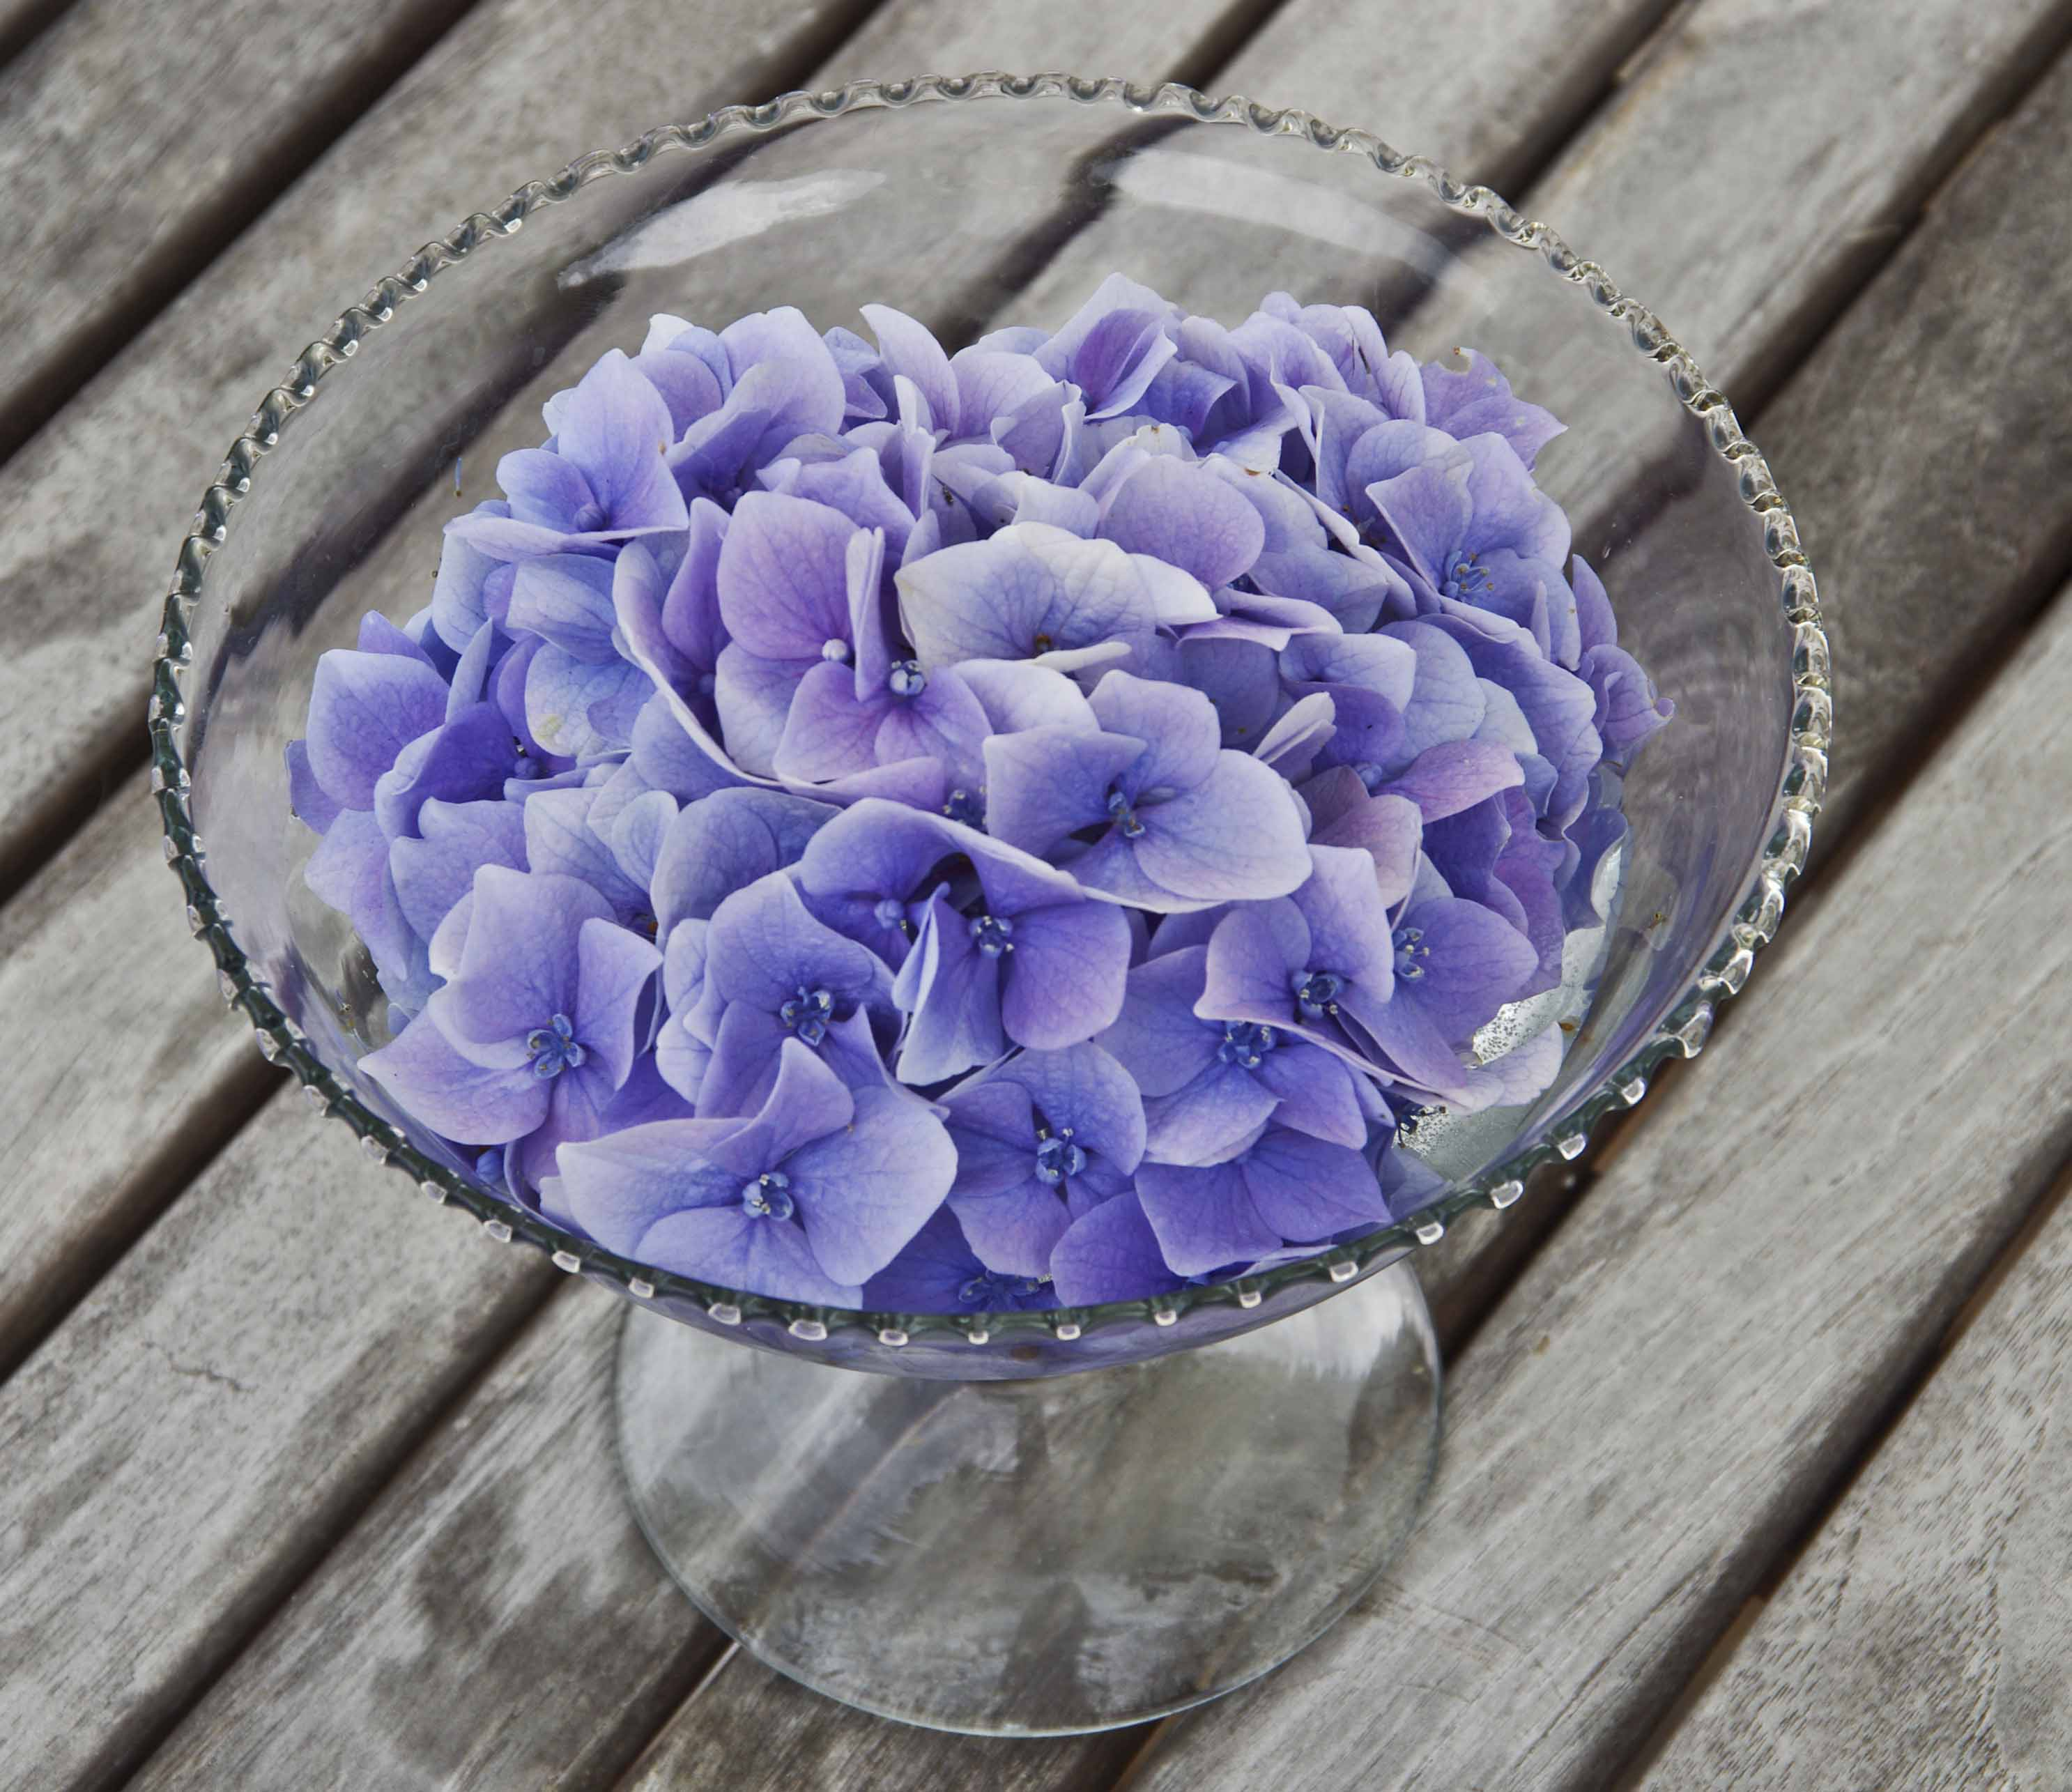 En hortensiablomst brakk av hortensiaen i potten. Vi la den i en skål med vann.